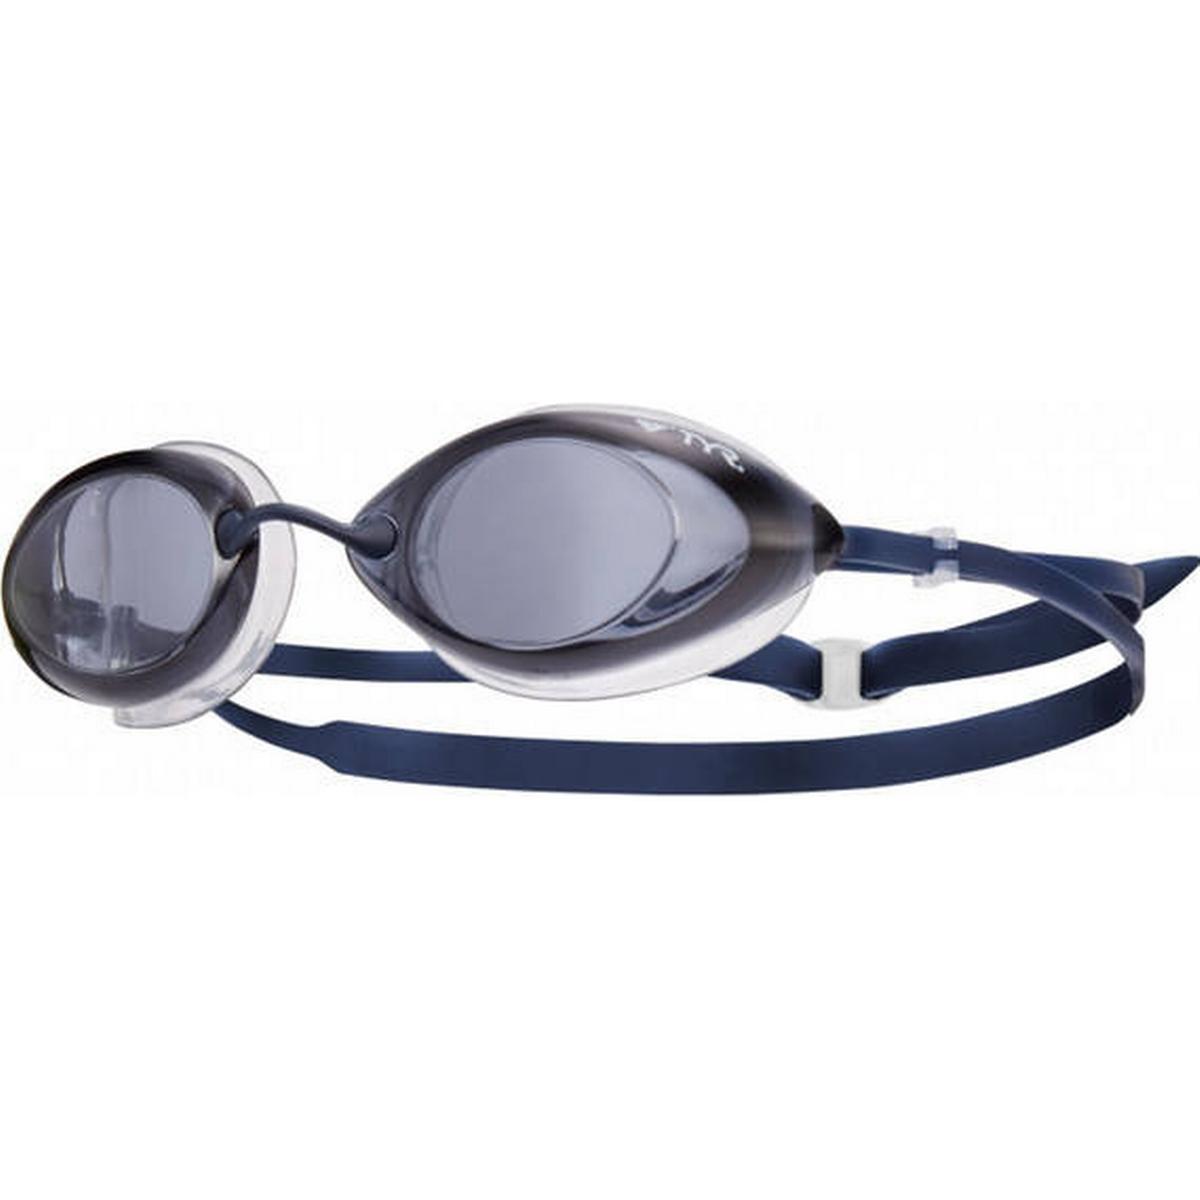 tyr Svømmebriller (100+ produkter) hos PriceRunner • Se